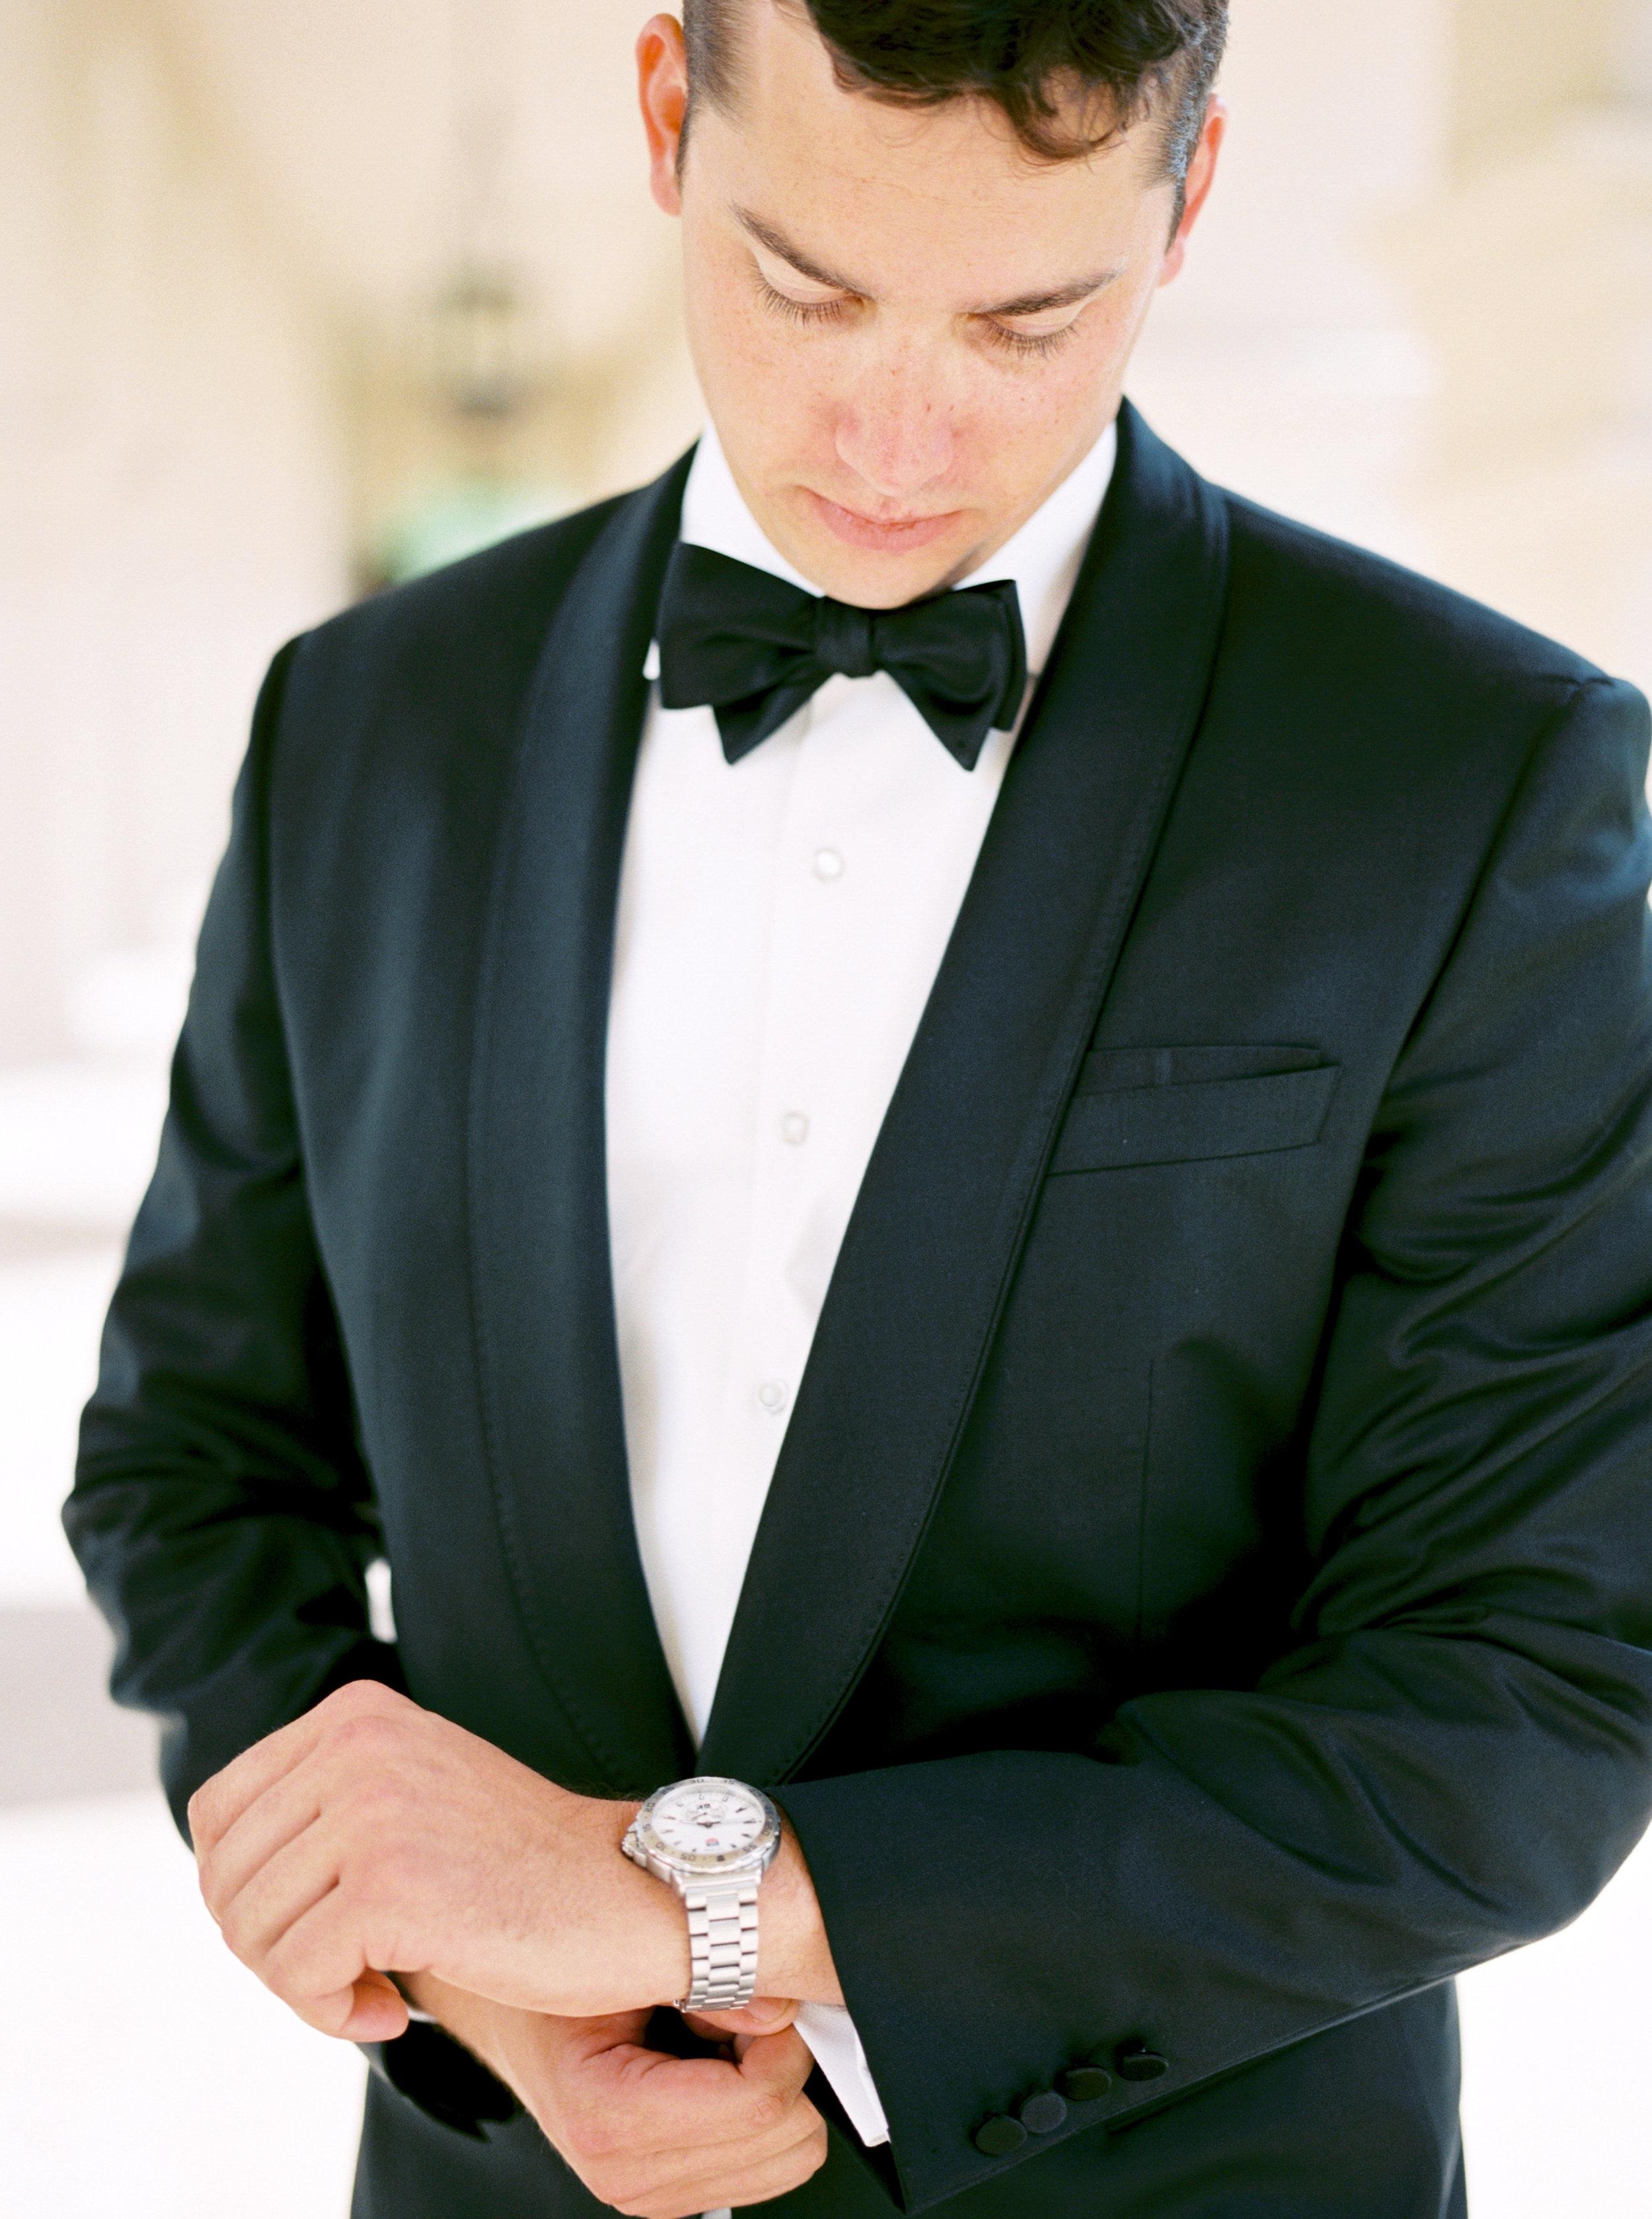 groom, groom details, formal groom attire, groom tux